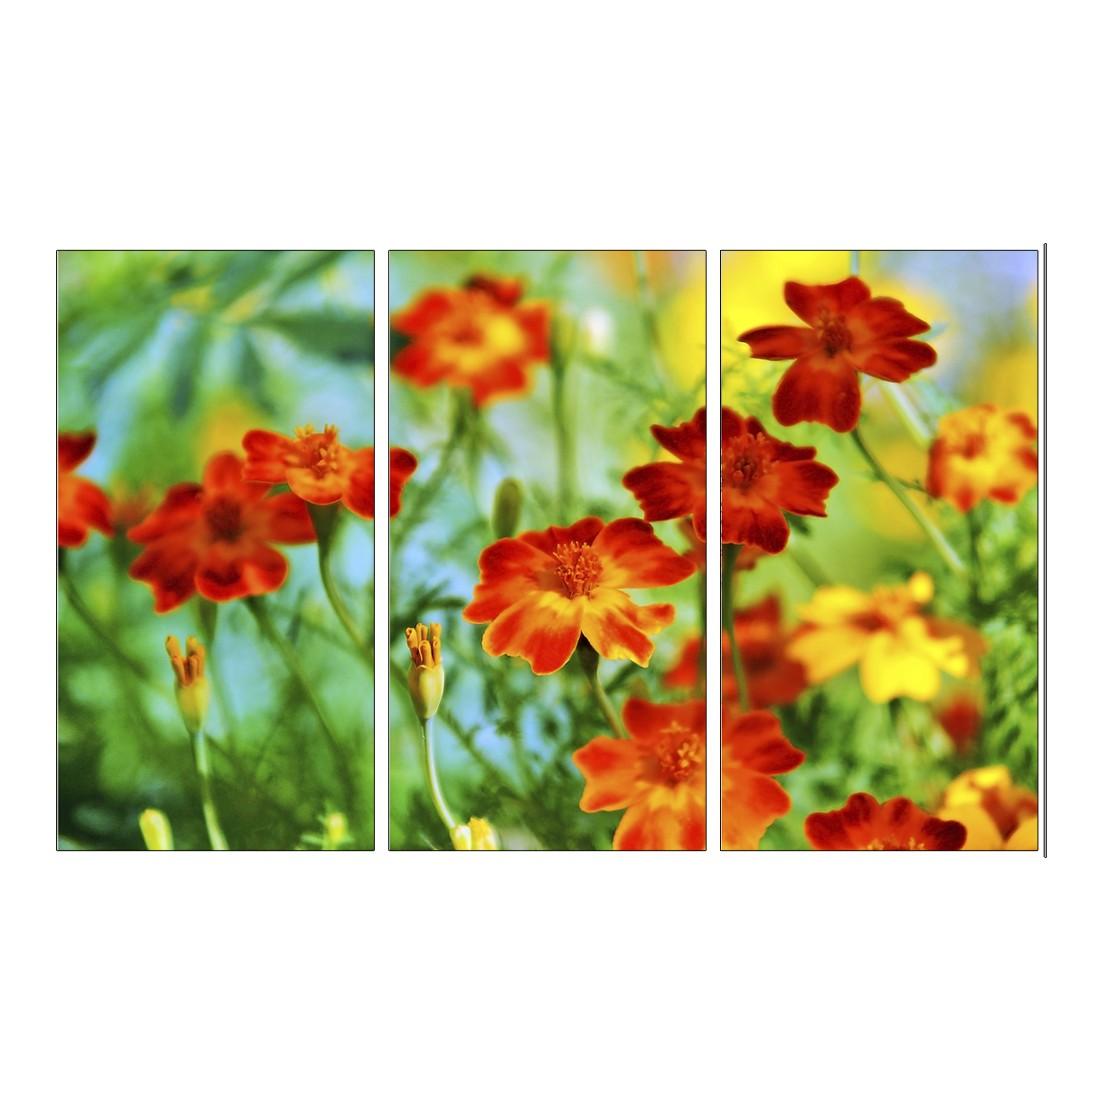 Leinwandbild Blumenmeer – 120 x 80cm, Gallery of Innovative Art online kaufen